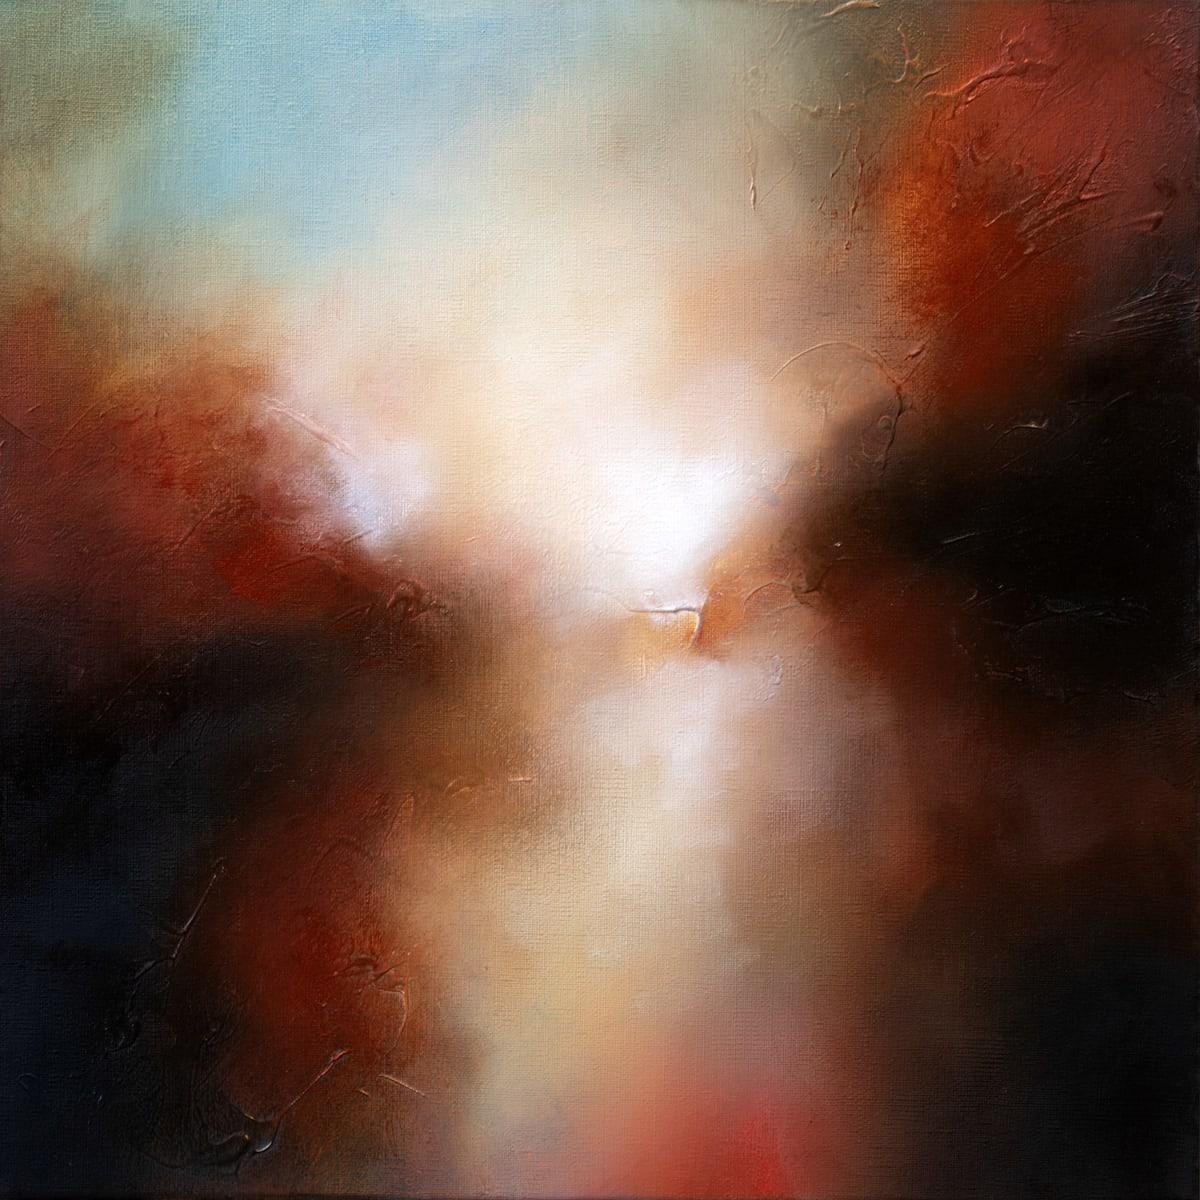 Paul Bennett State of Light 2 , 2019 Oil on Deep Edged Canvas 40 x 40 cm 15 3/4 x 15 3/4 in